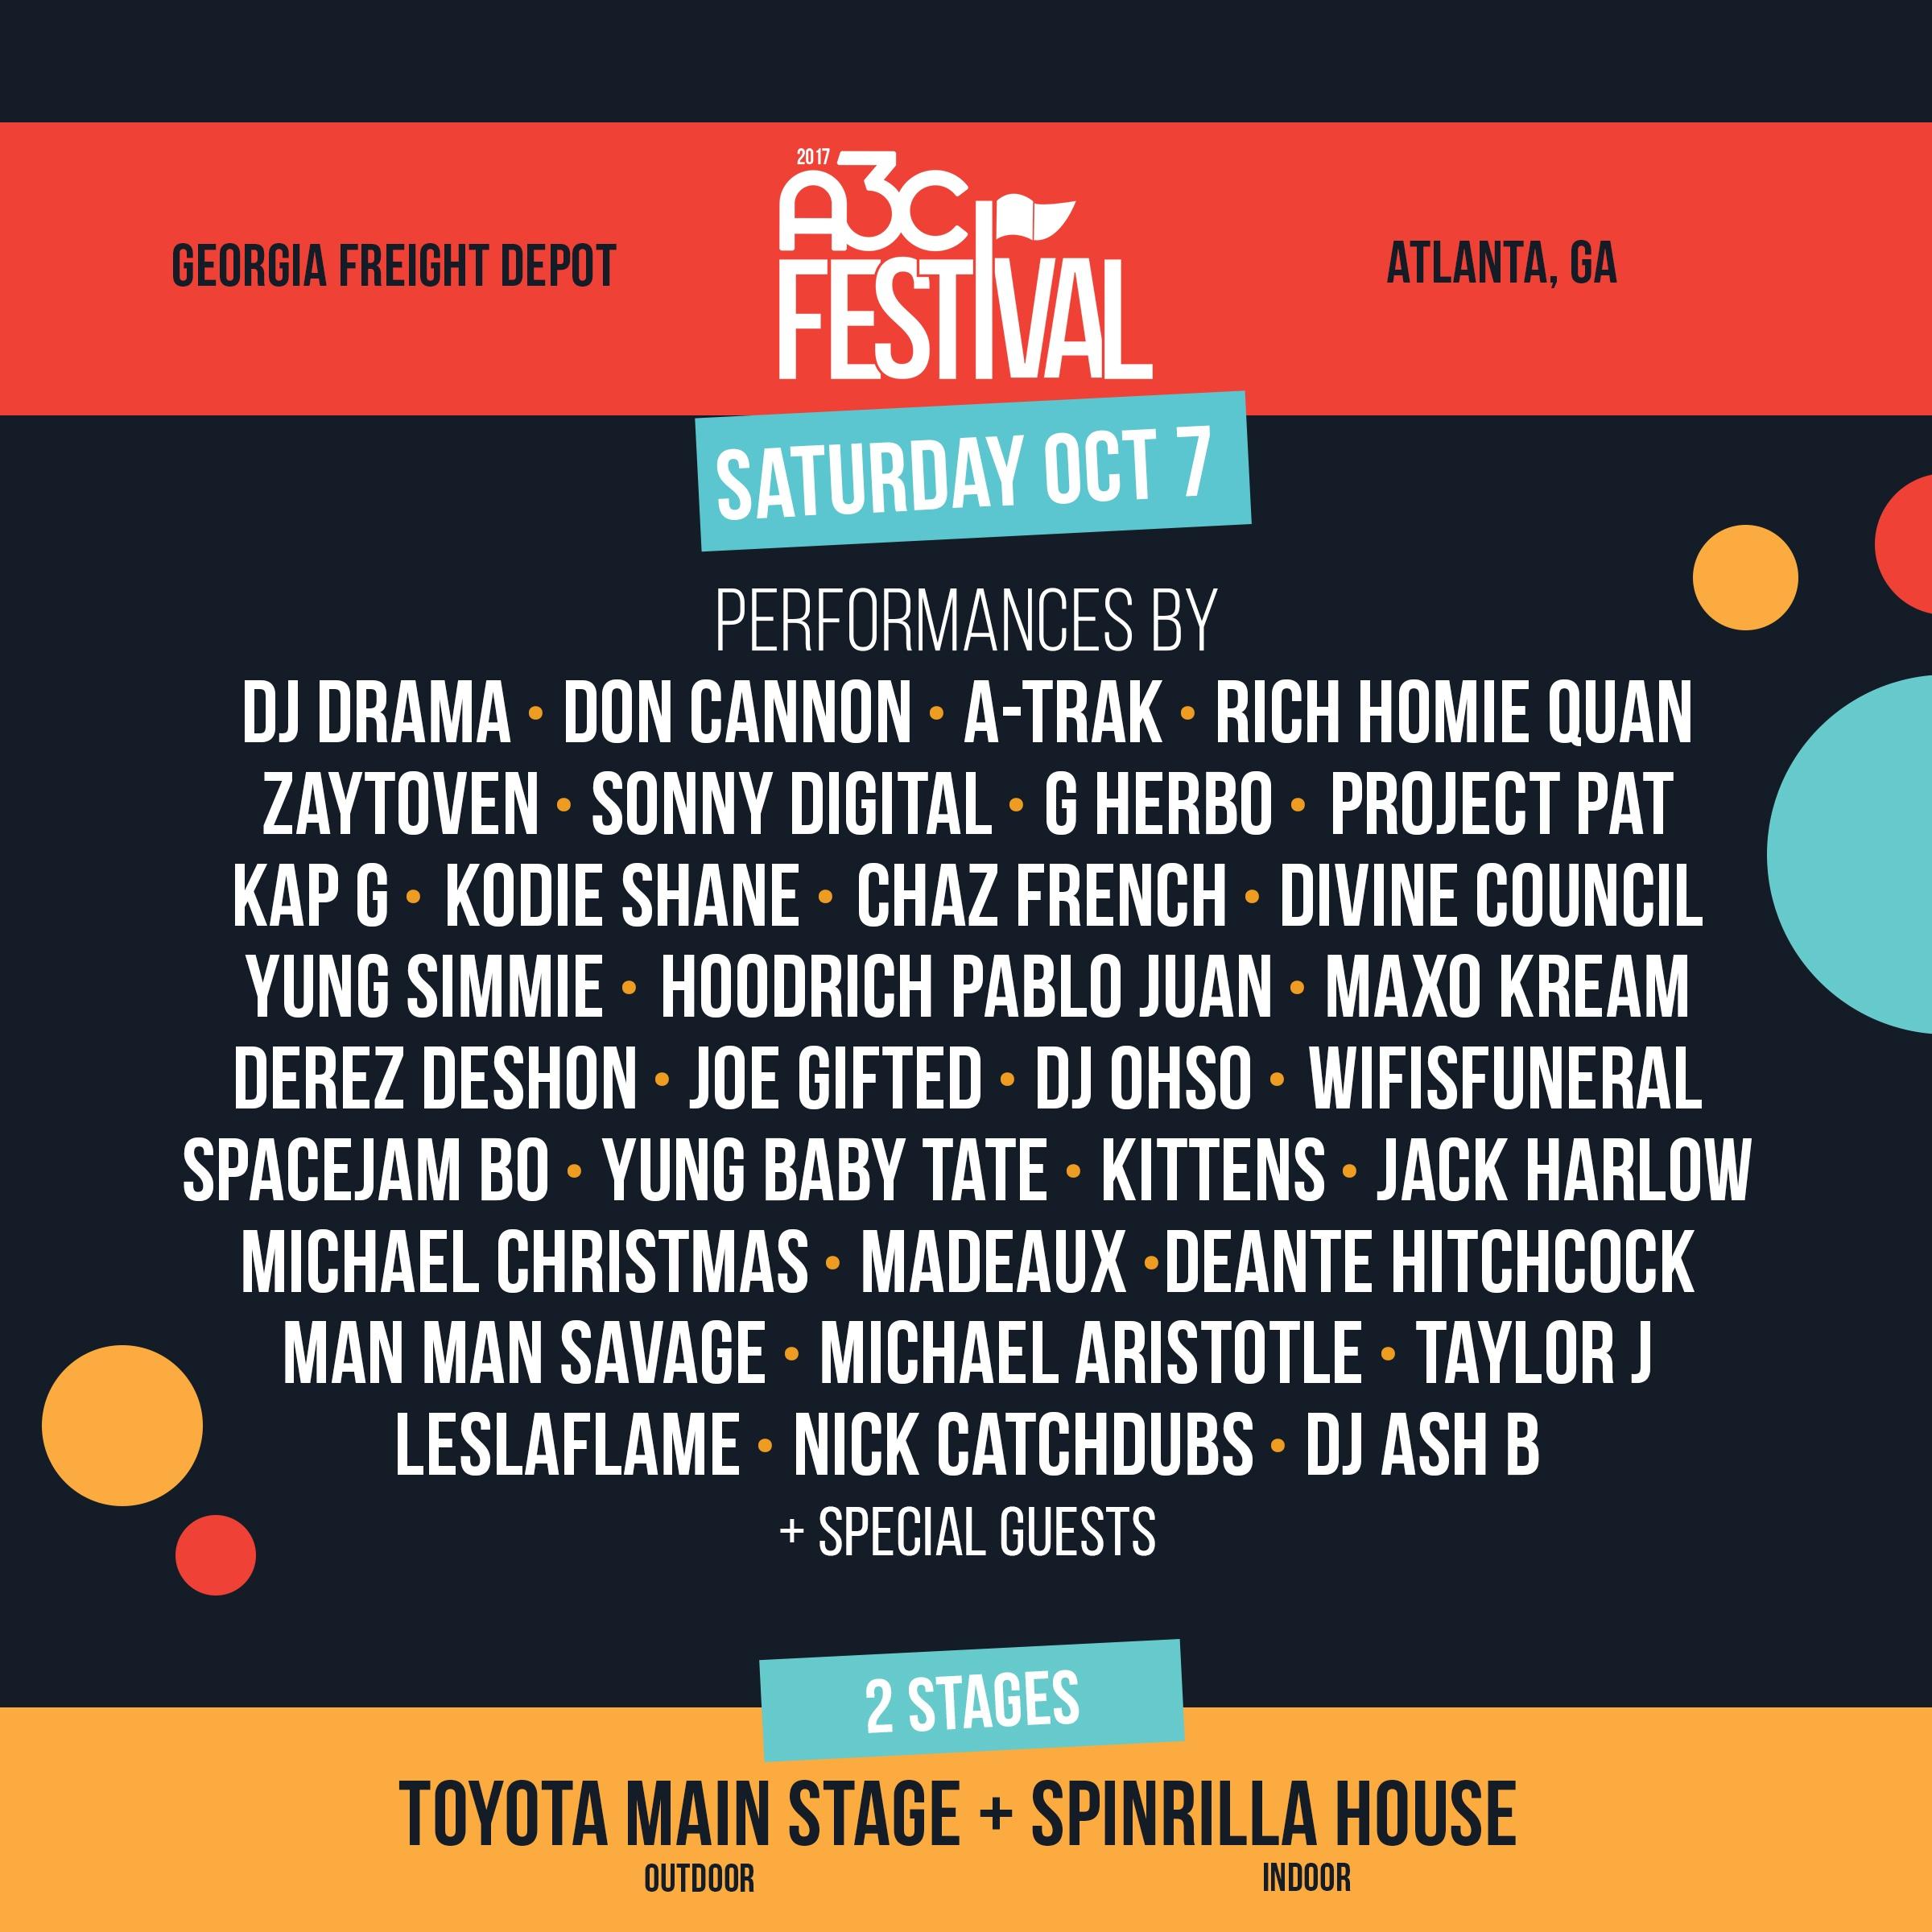 festival-saturday (1).jpg